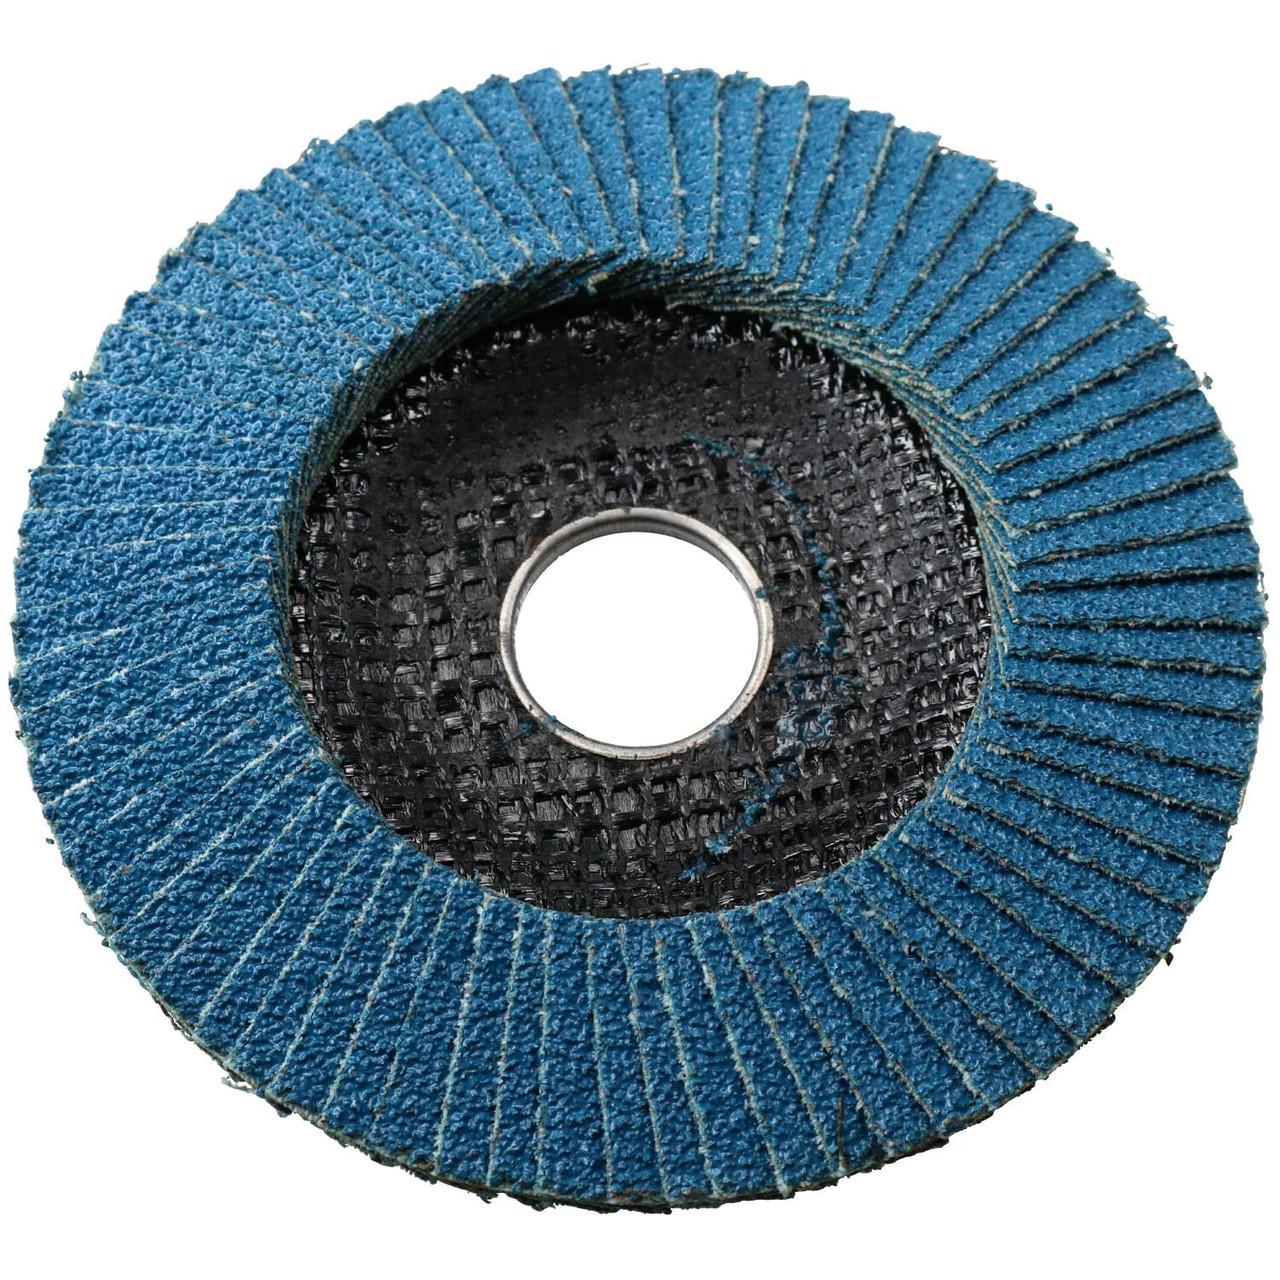 "60 Grit Zirconium Flap Discs for Sanding Grinding Removal 4-1//2/"" Grinder 10pc"